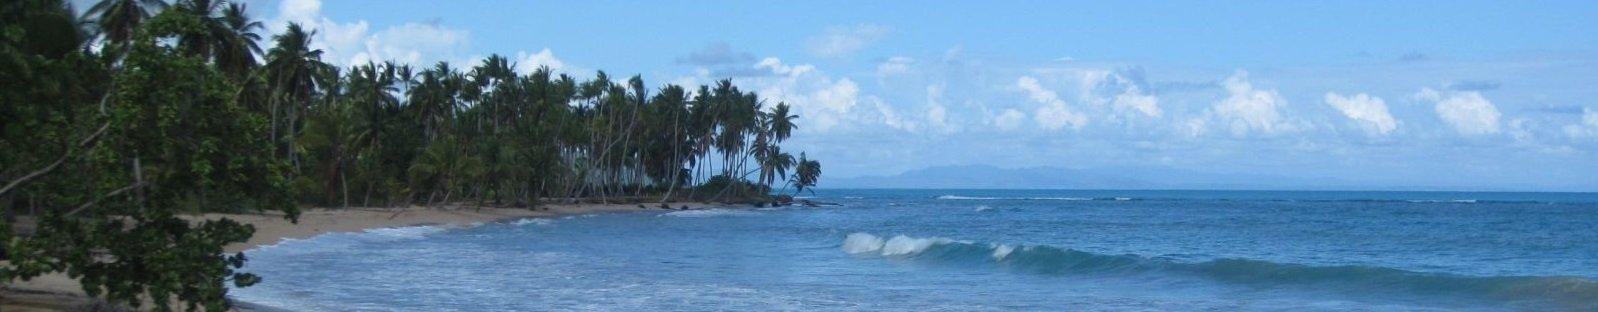 3rd-best-beaches-in-Dominican-Republic-Playa-Cayac